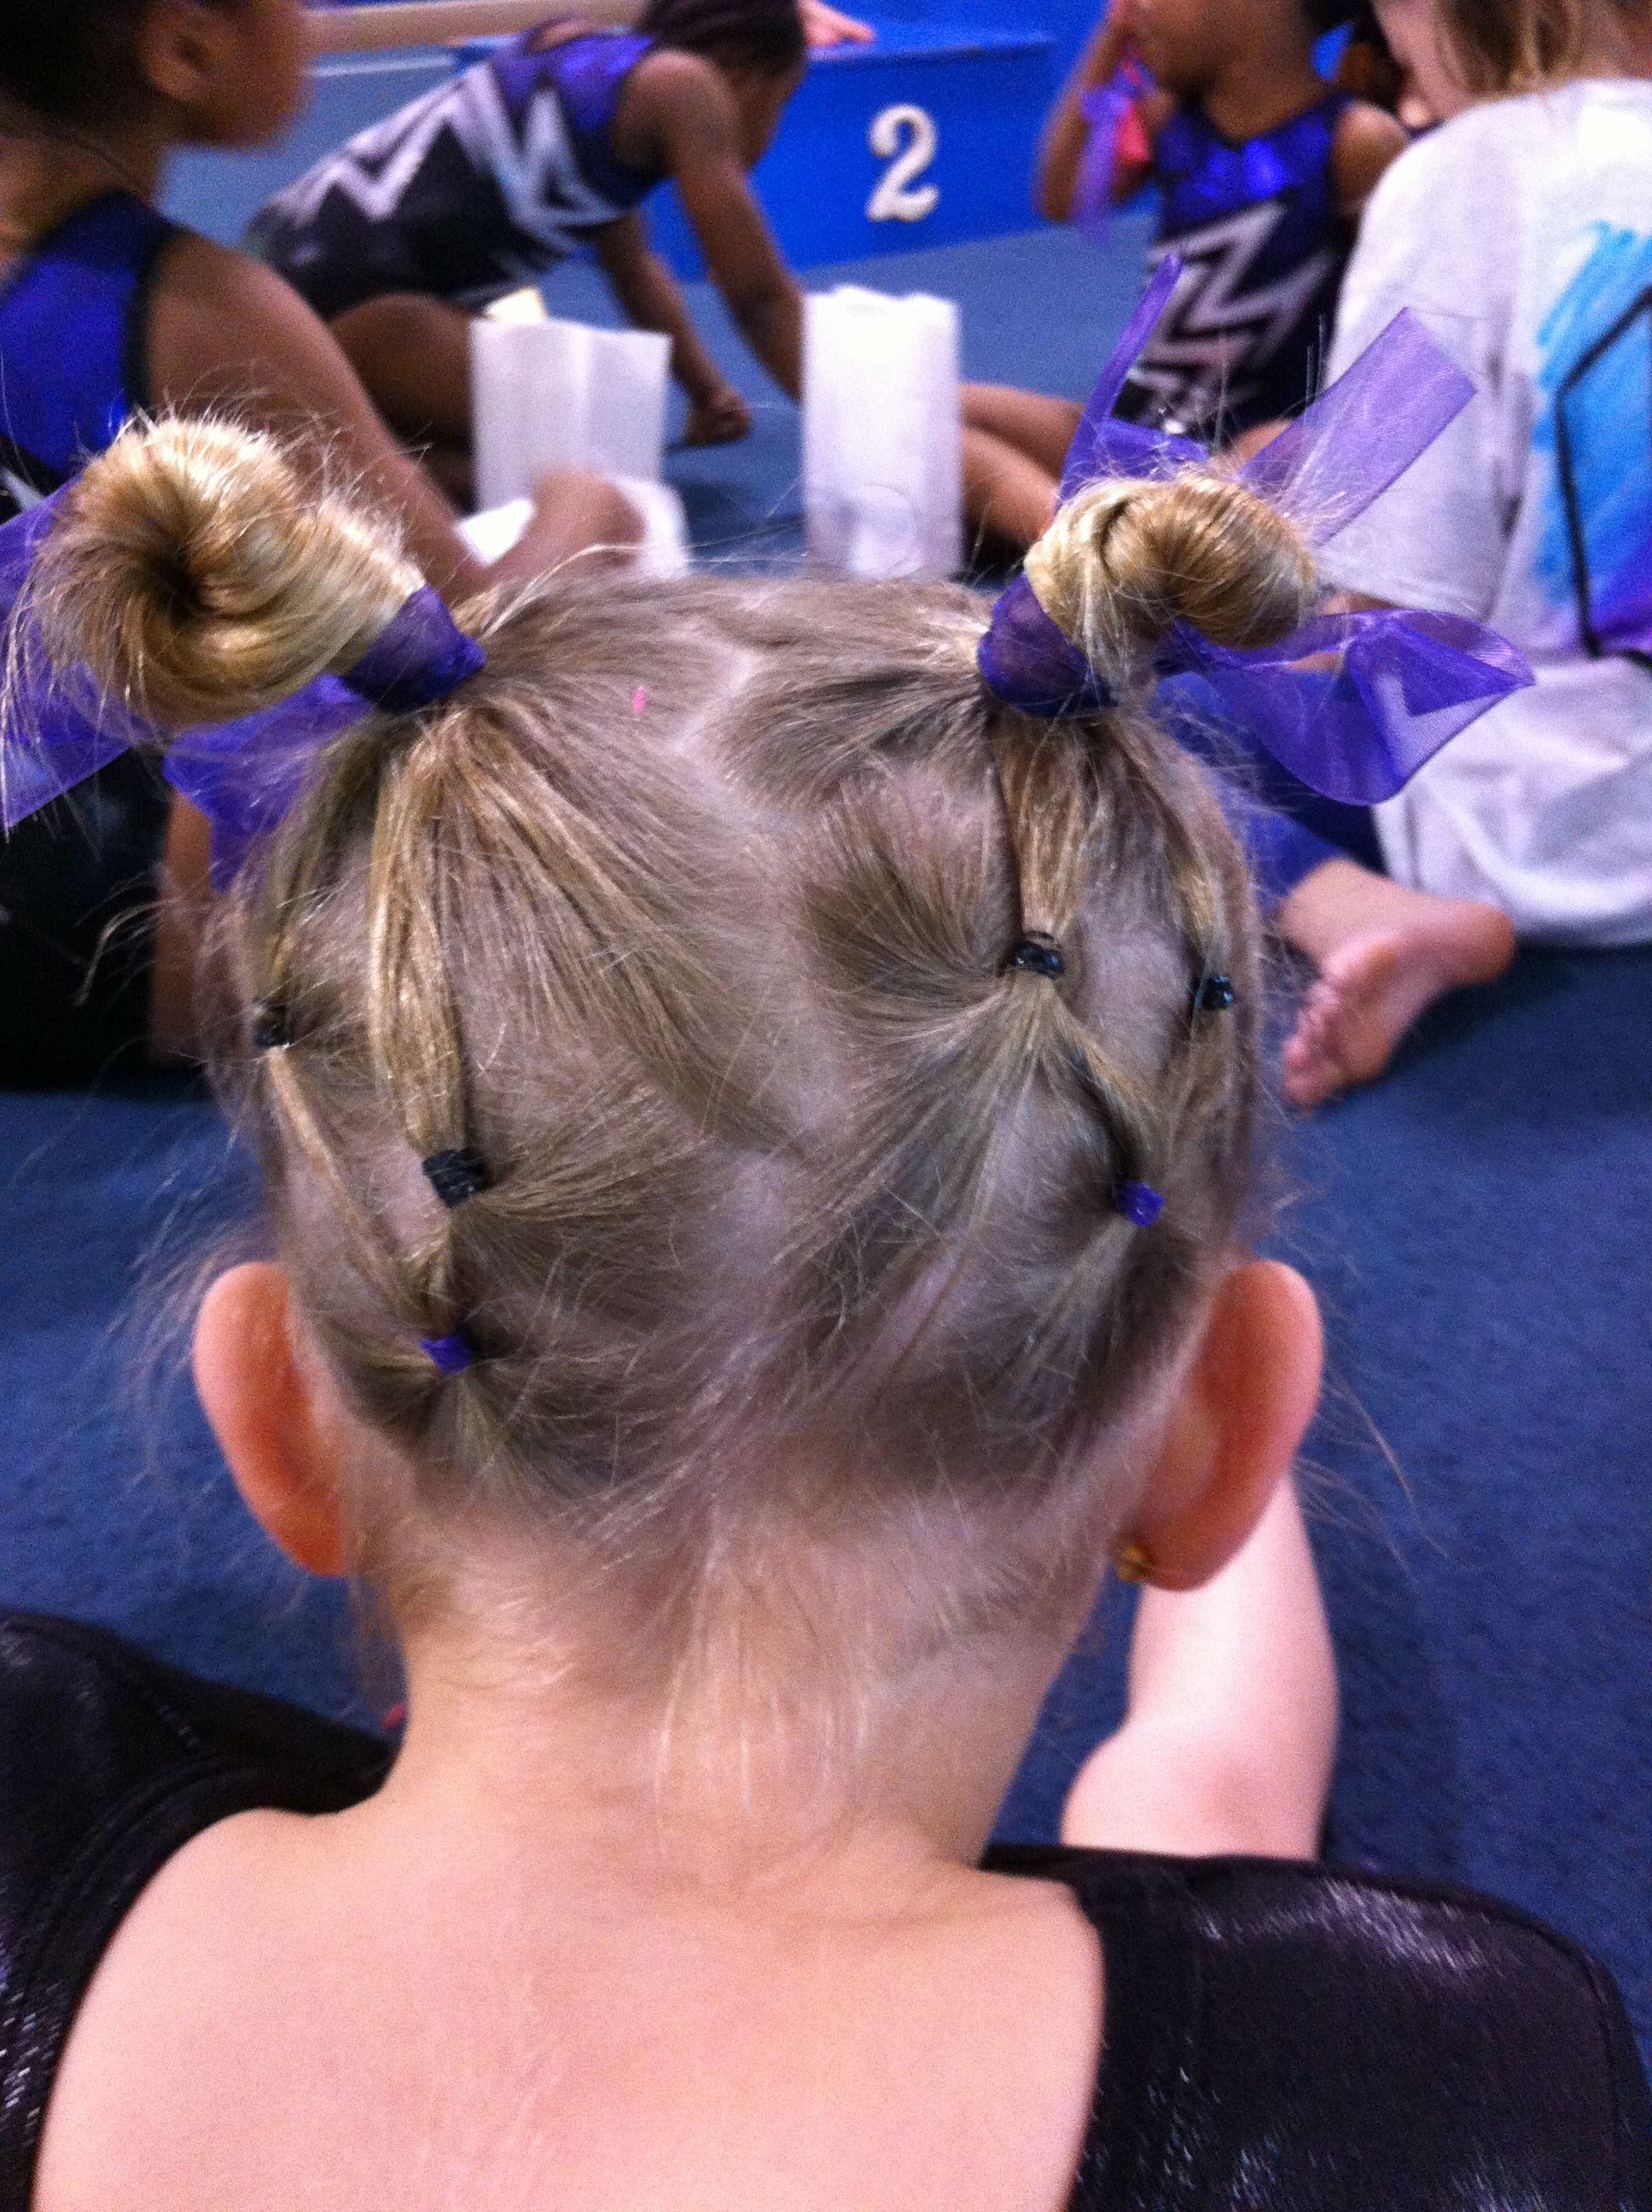 Gymnastics hair | Gymnastics hair, Gym hairstyles ...